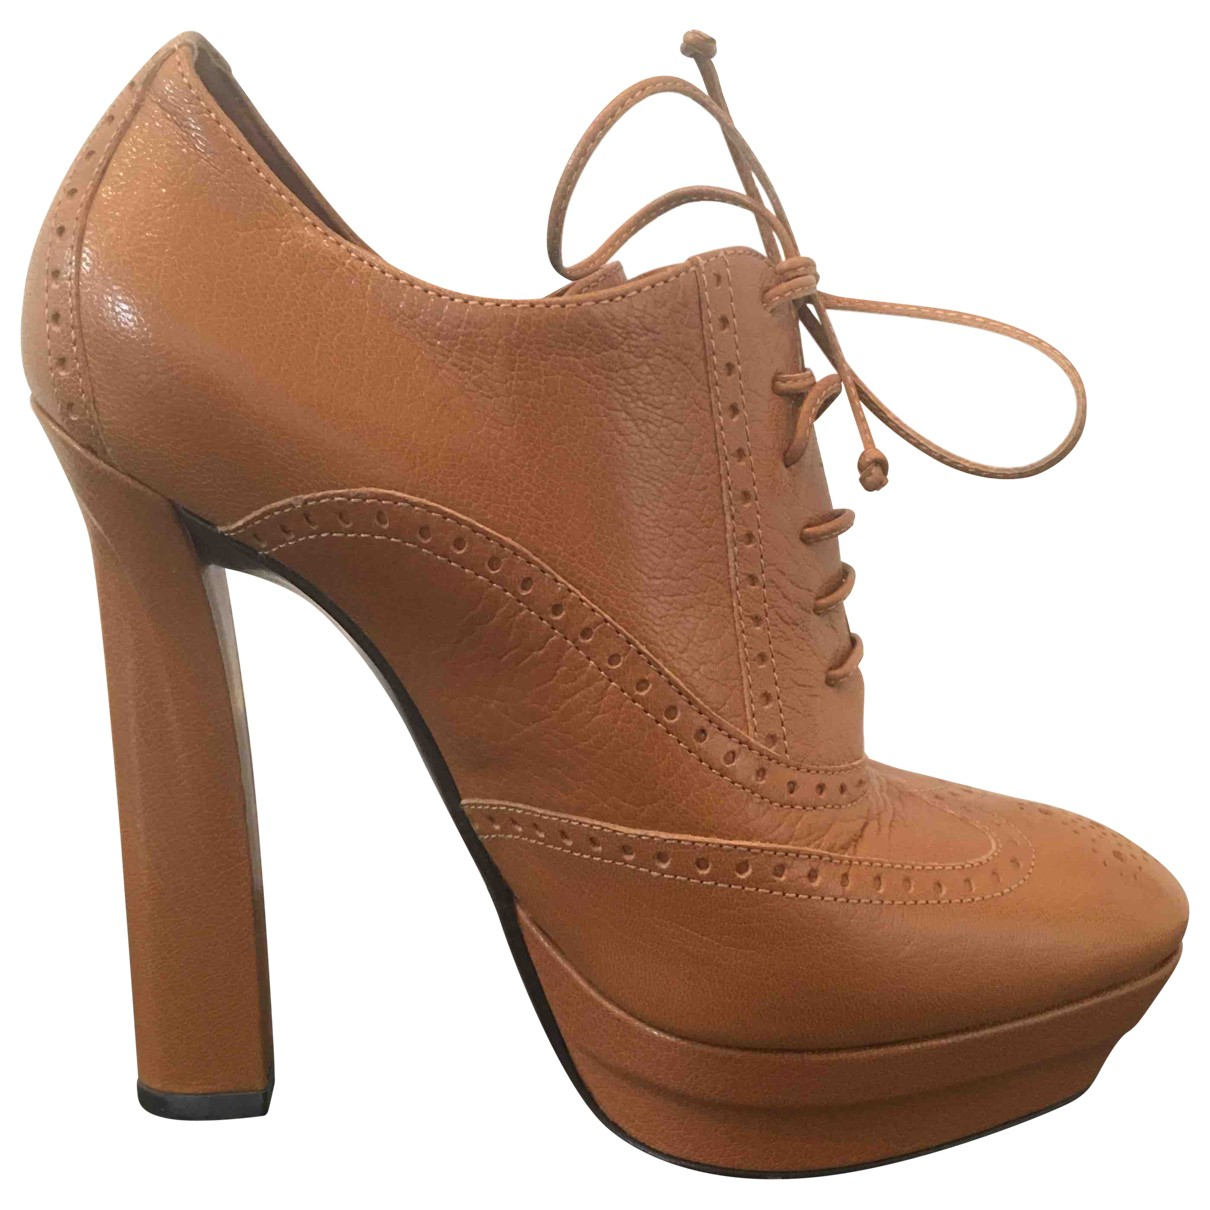 Bottega Veneta \N Camel Leather Heels for Women 37 IT